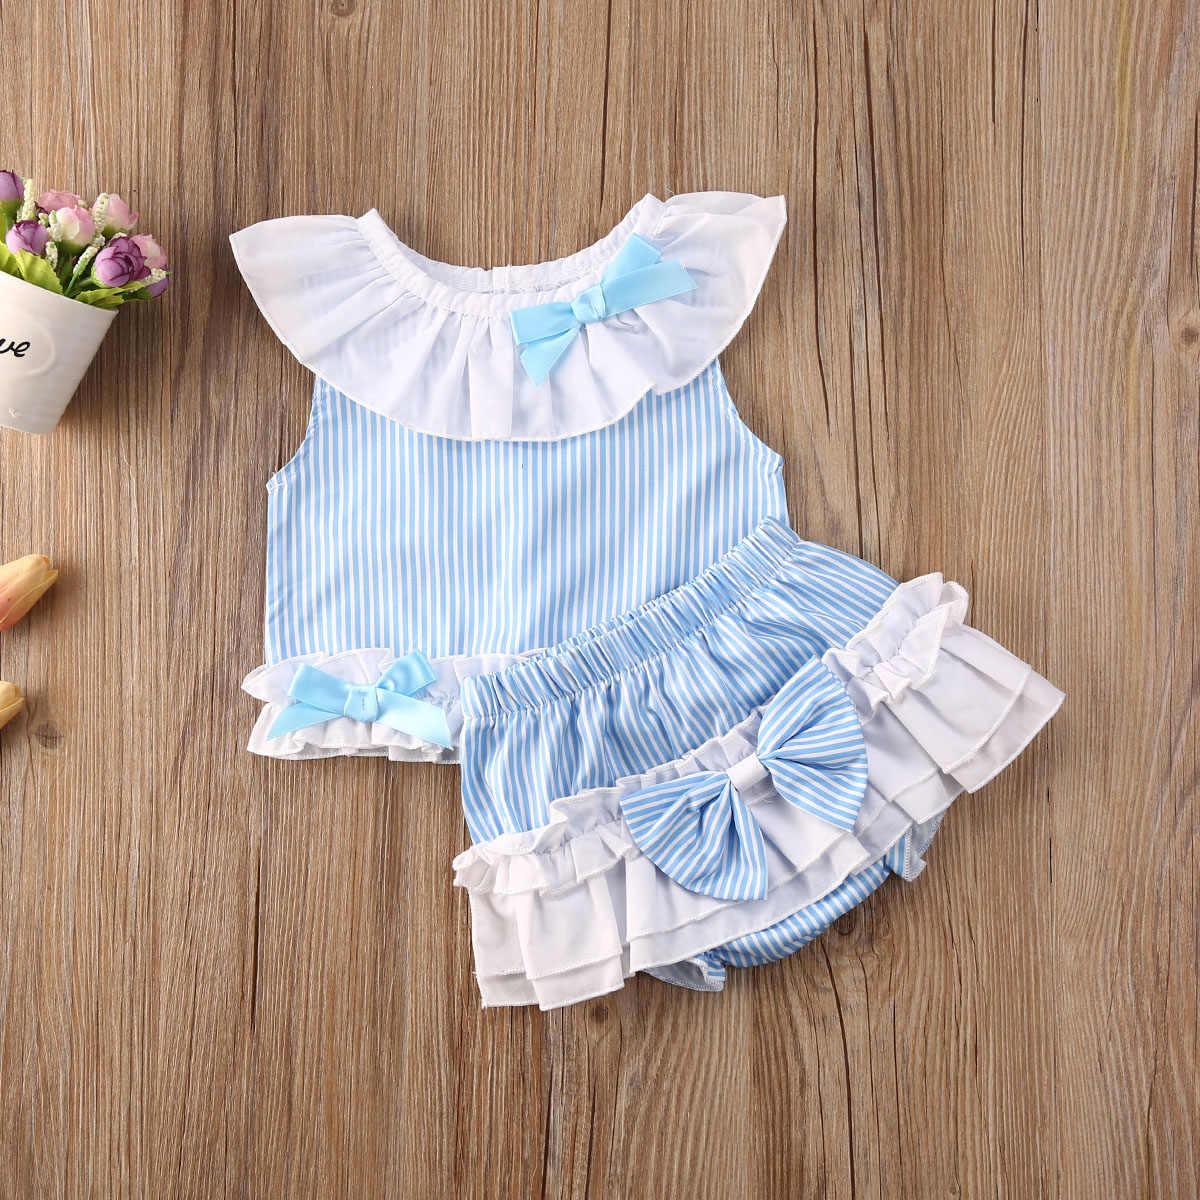 Pasgeboren Baby Baby Meisjes Prinses Zomer Boog Korte Mouwen T-shirts Tops + Shorts 2 Stuks Set 0-24M